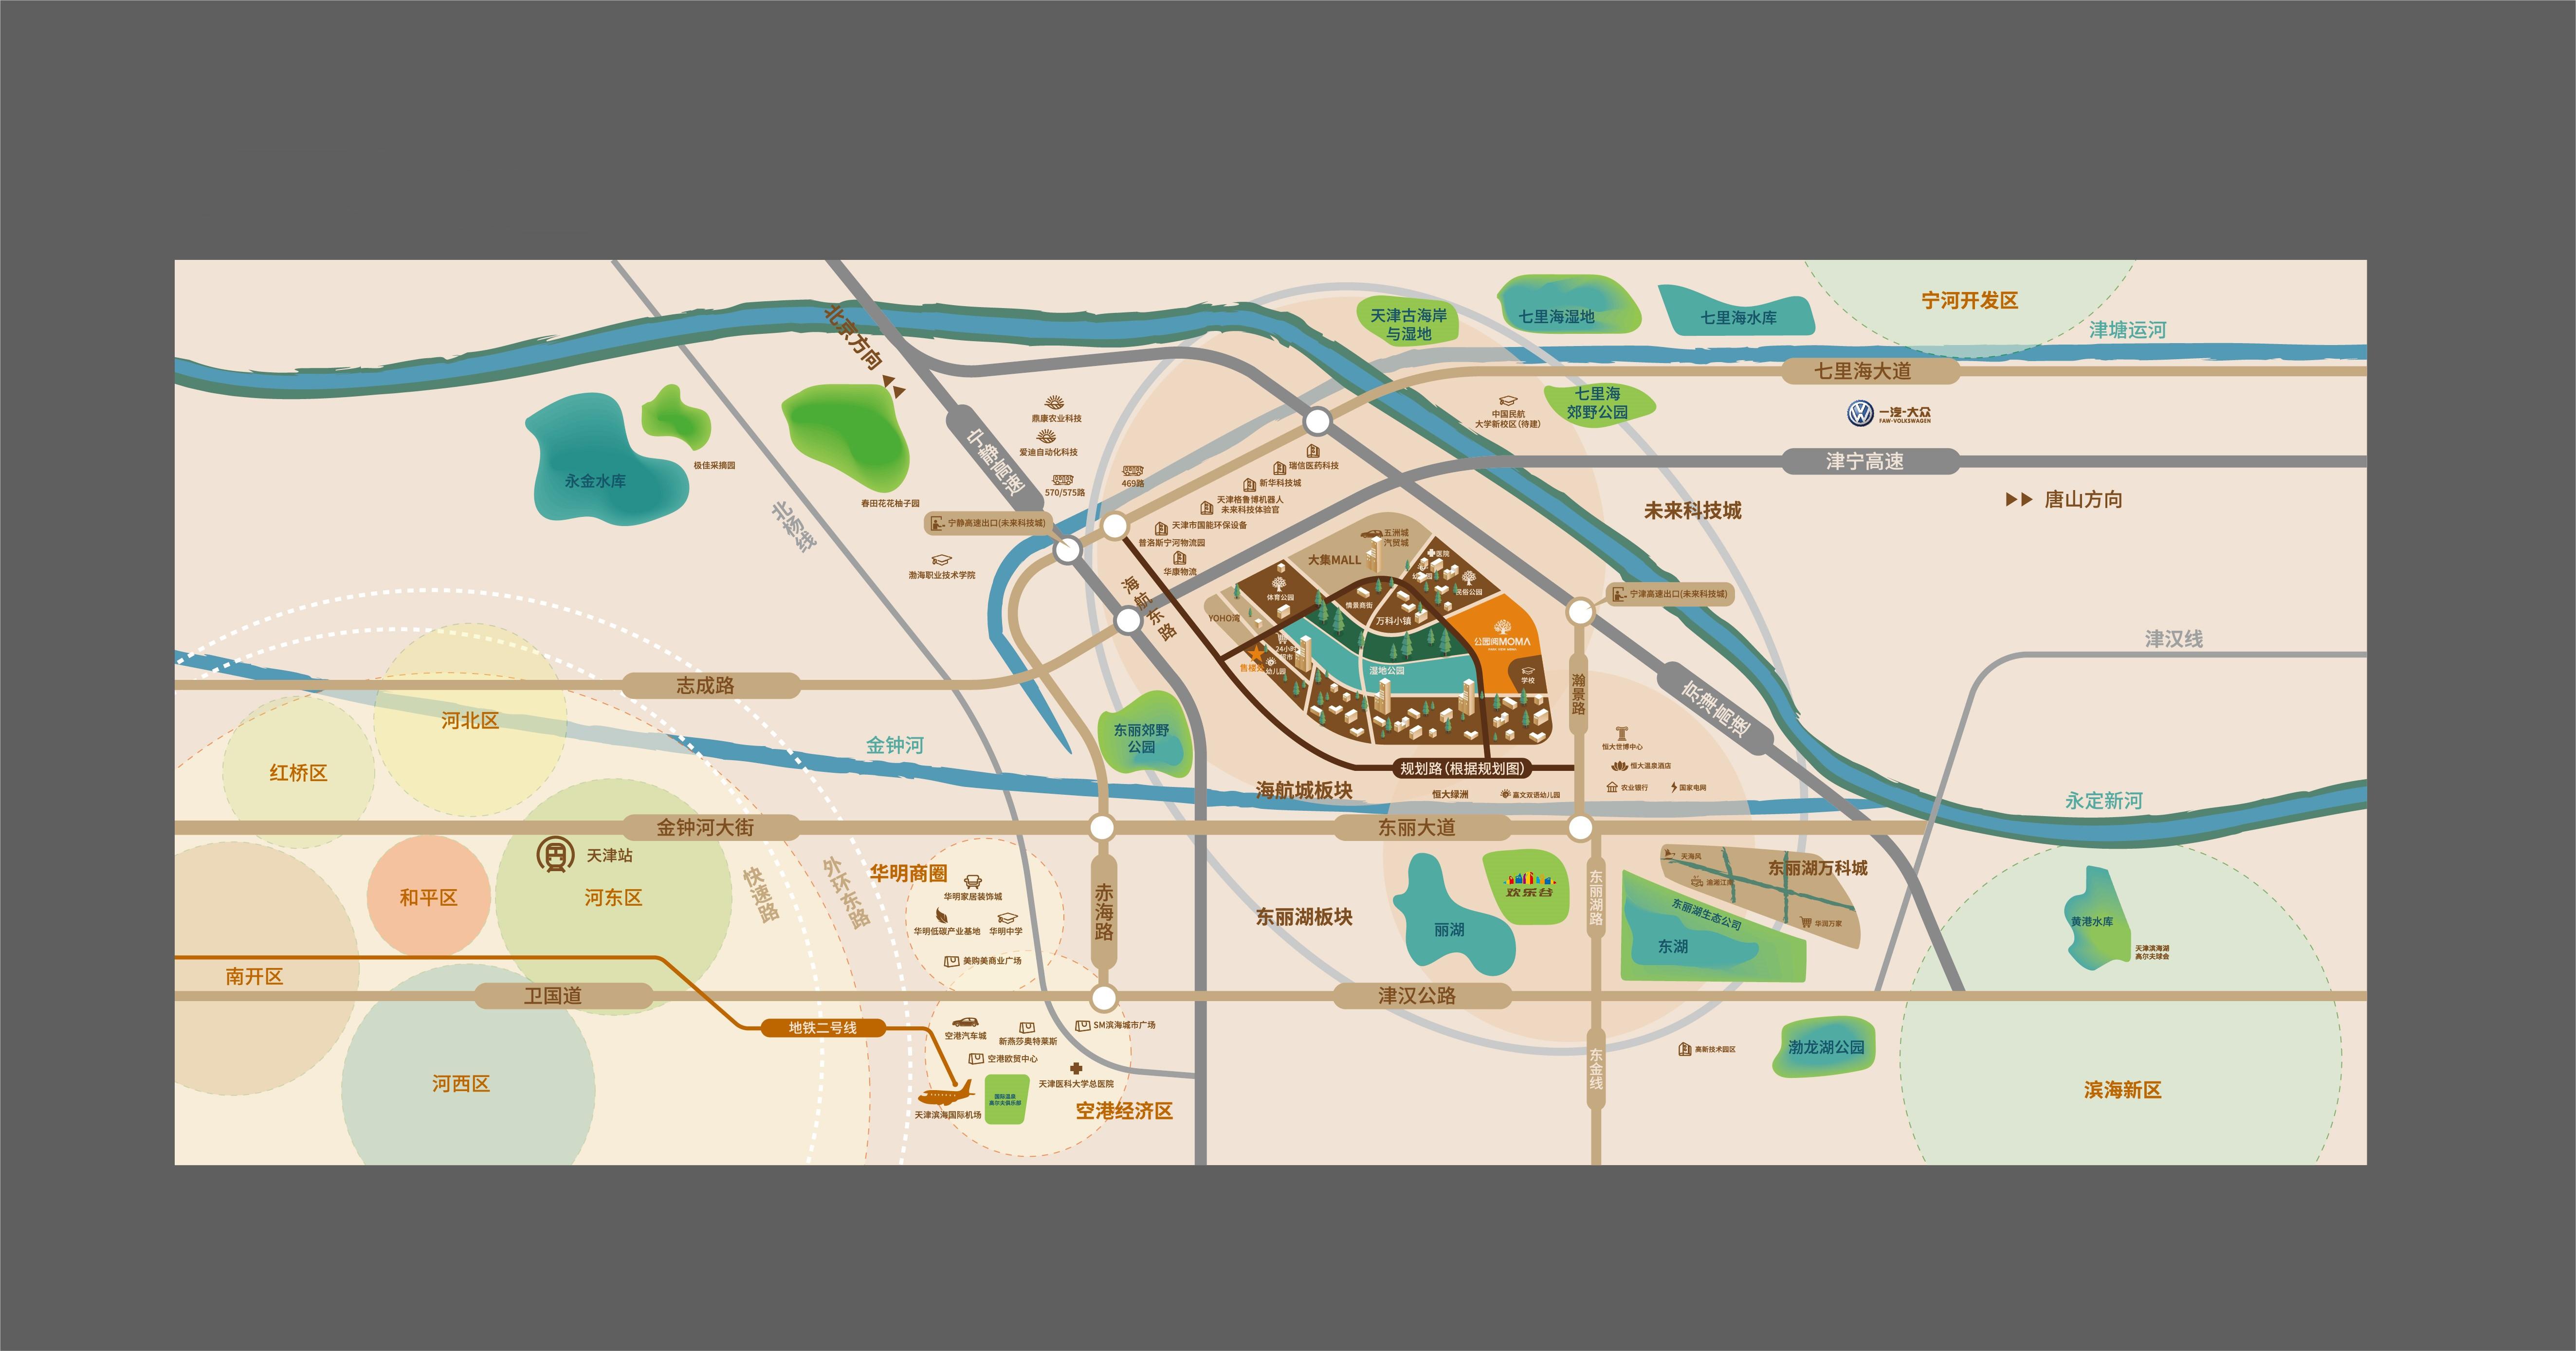 当代公园阅ΜΟΜΛ交通图